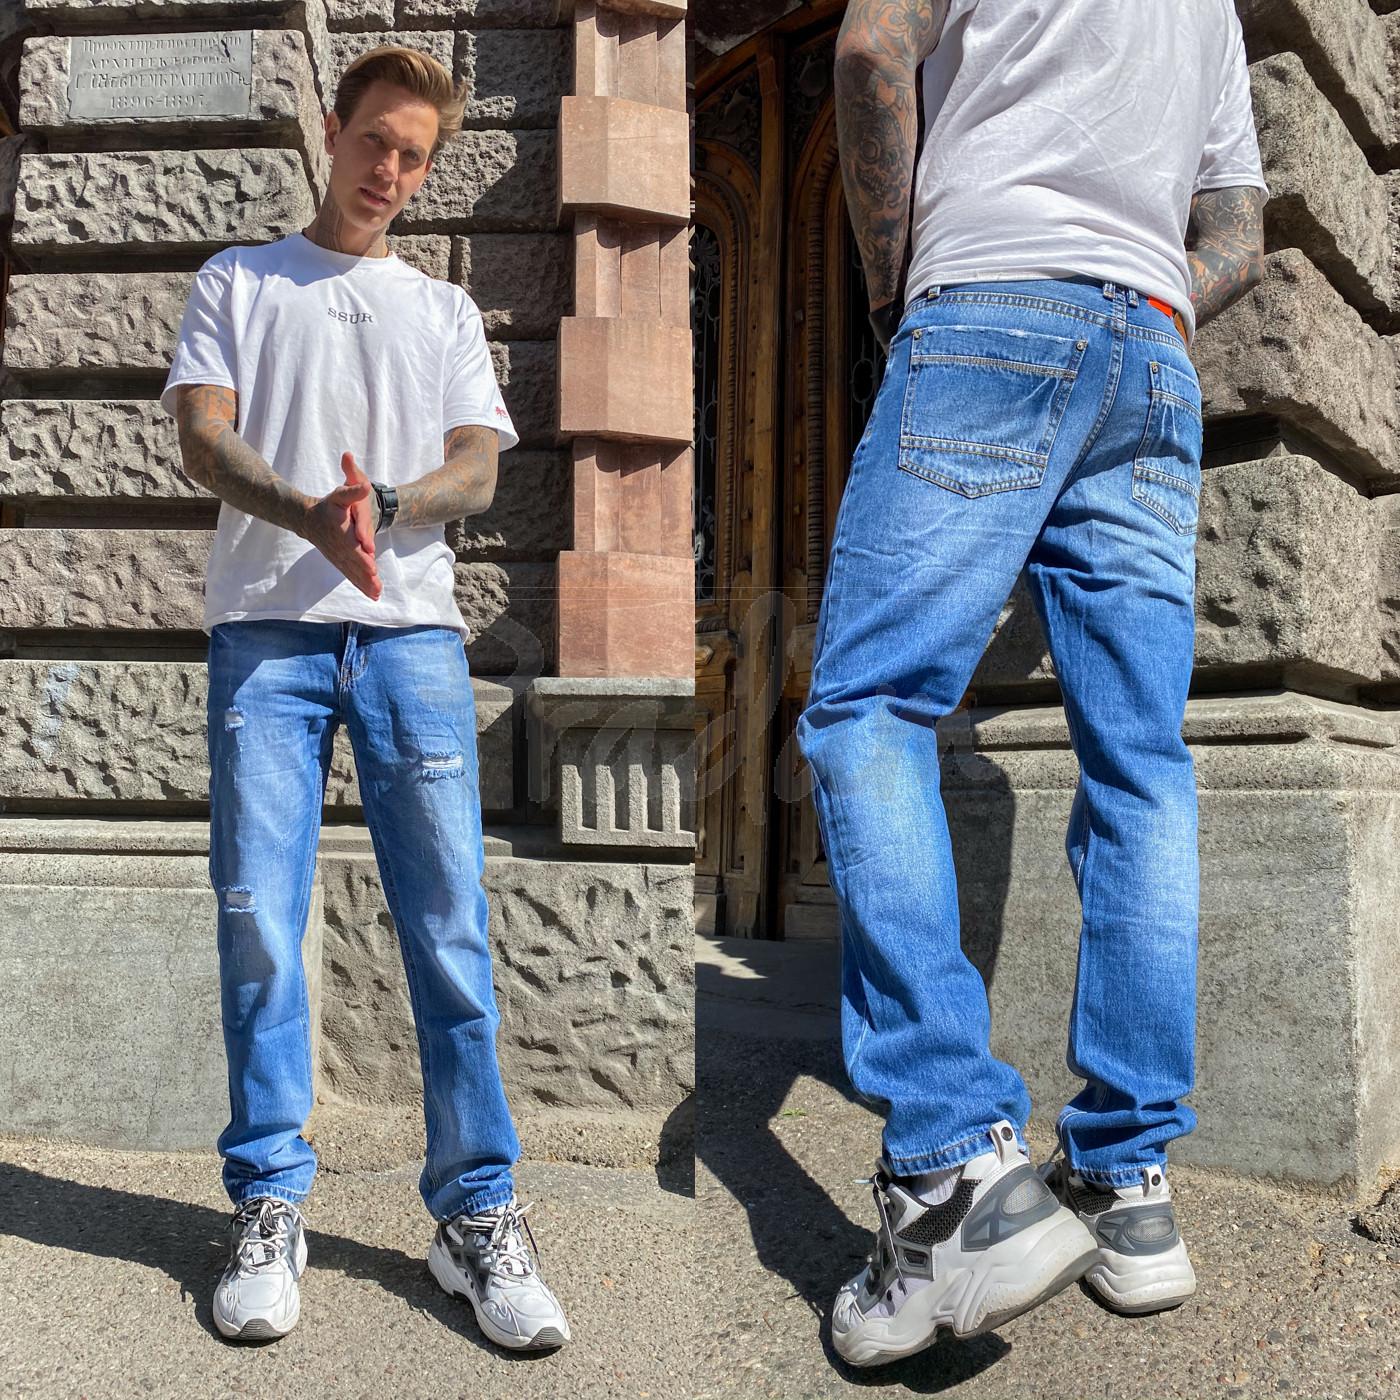 9903-01 Relucky джинсы мужские голубые стрейчевые (3 ед. размеры: 29.30.32)